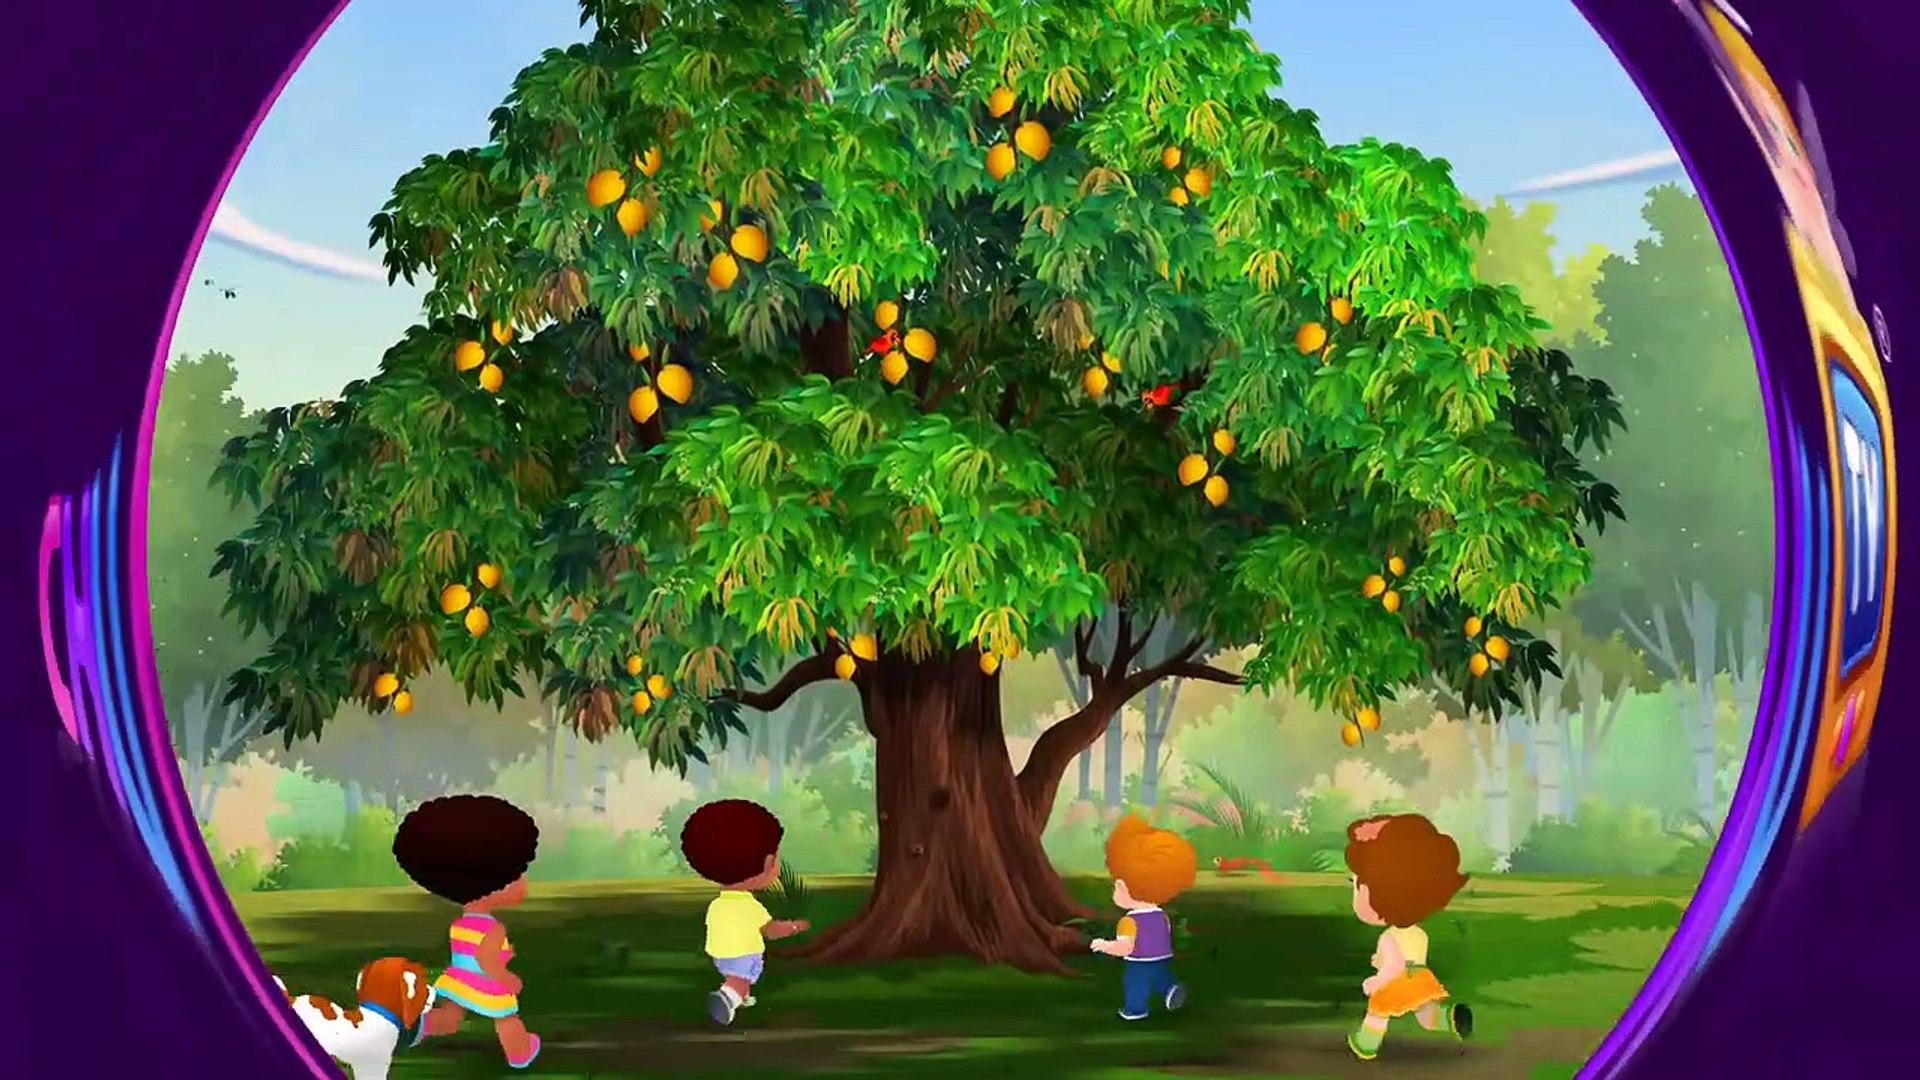 Mango Tree Cartoon / International mango festival , mango cartoon, yellow mango illustration png clipart.